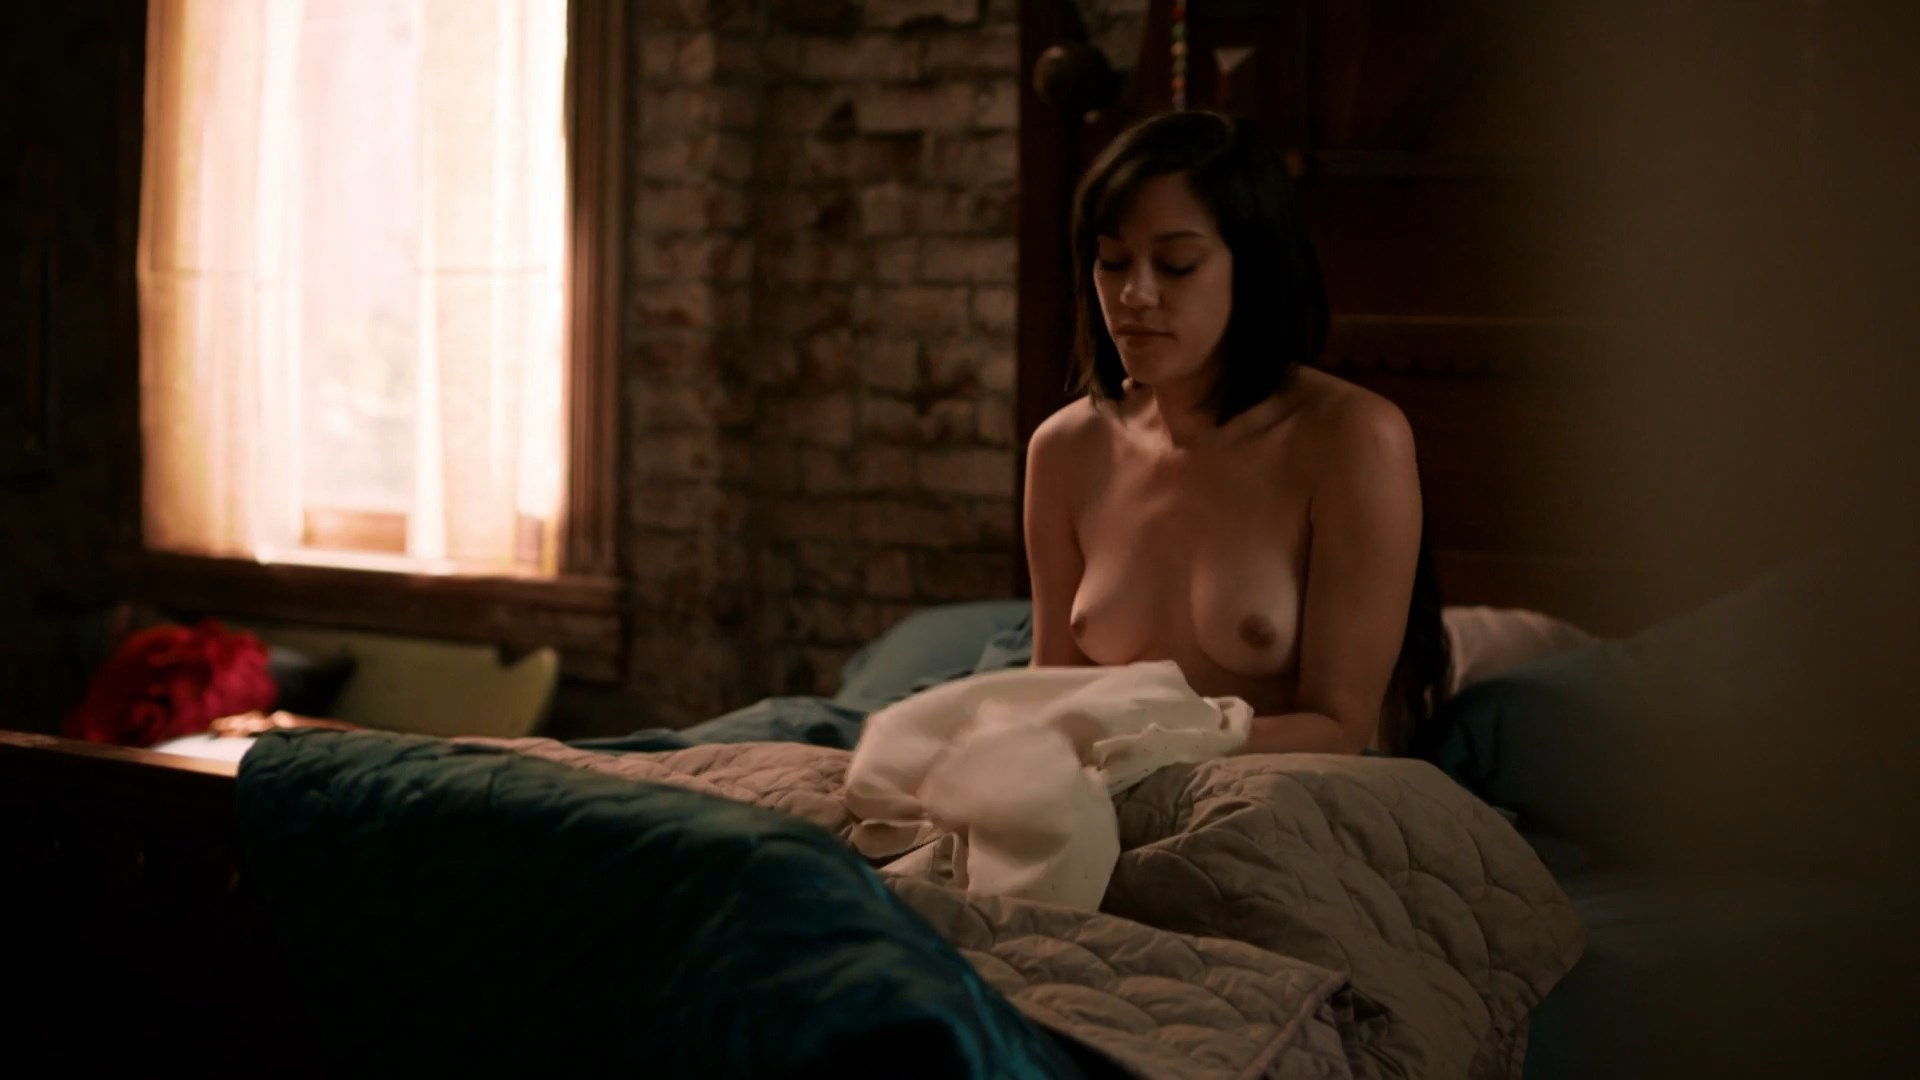 Maria-elena laas nude